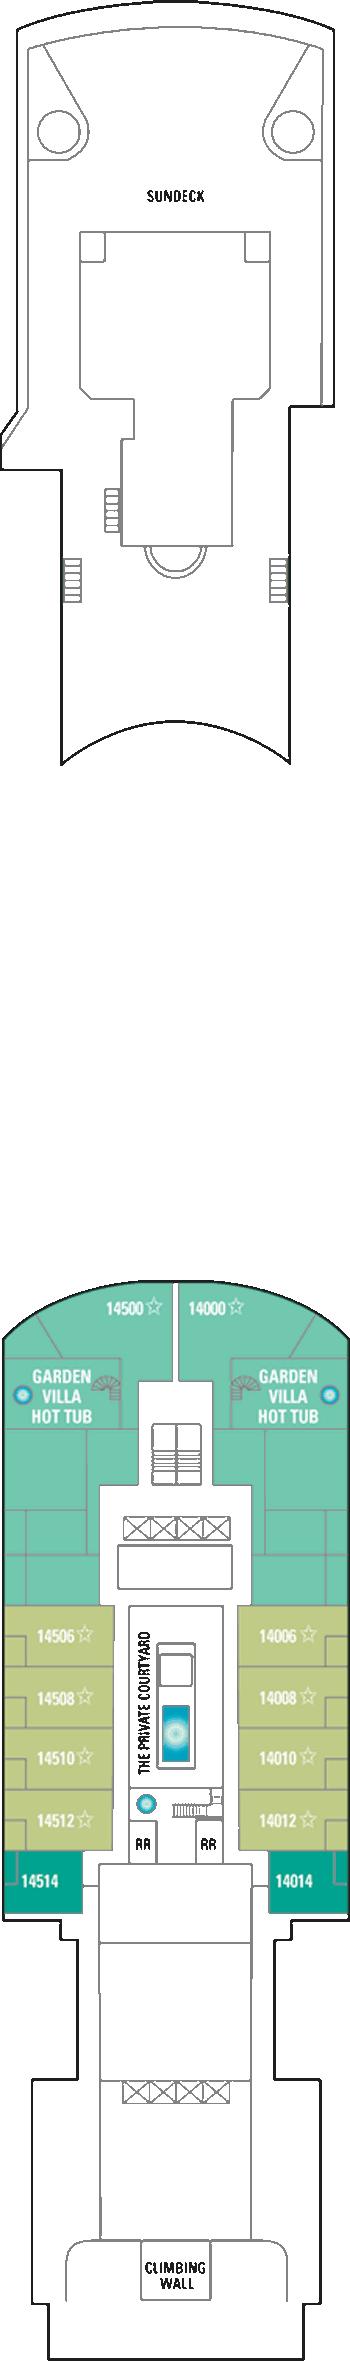 Norwegian Gem - Deck 14